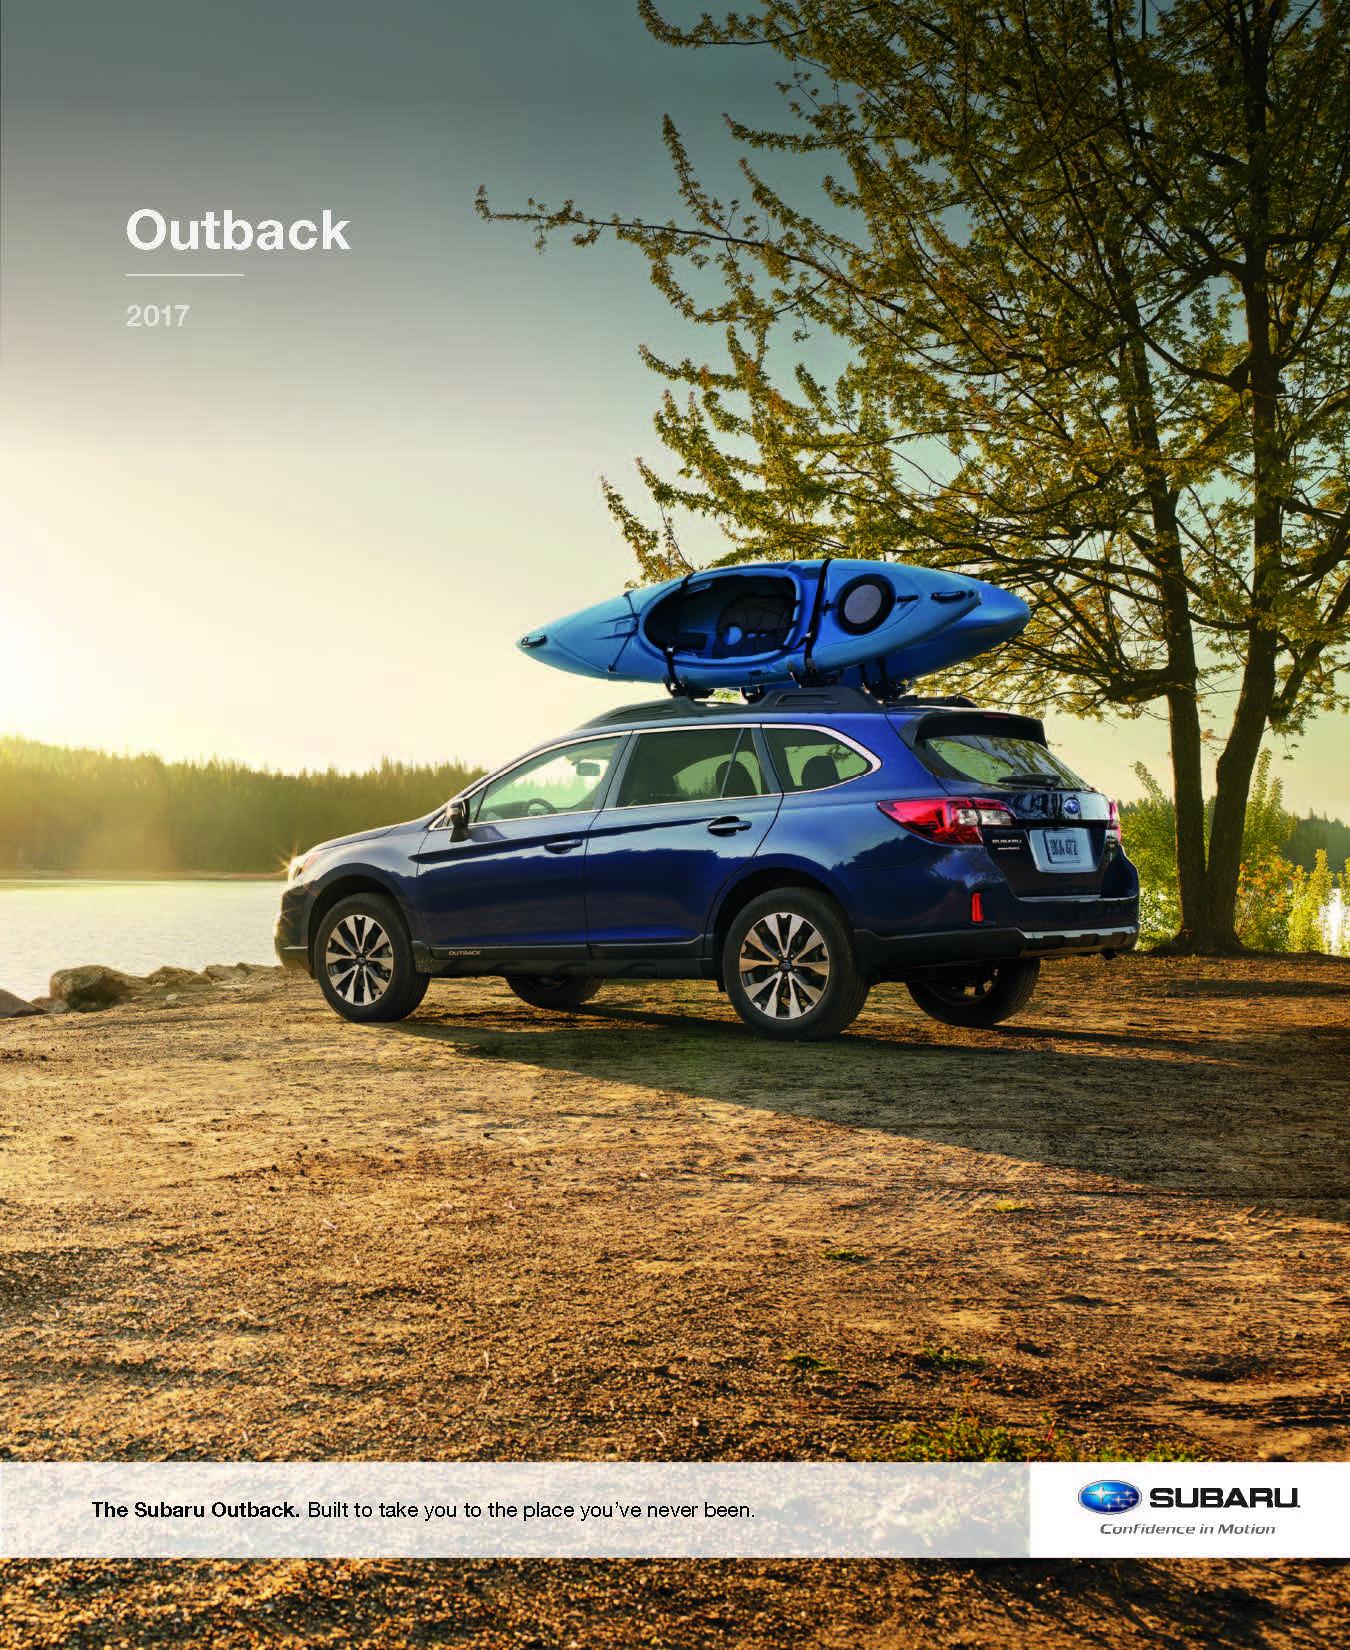 2017 Subaru Outback Brochure